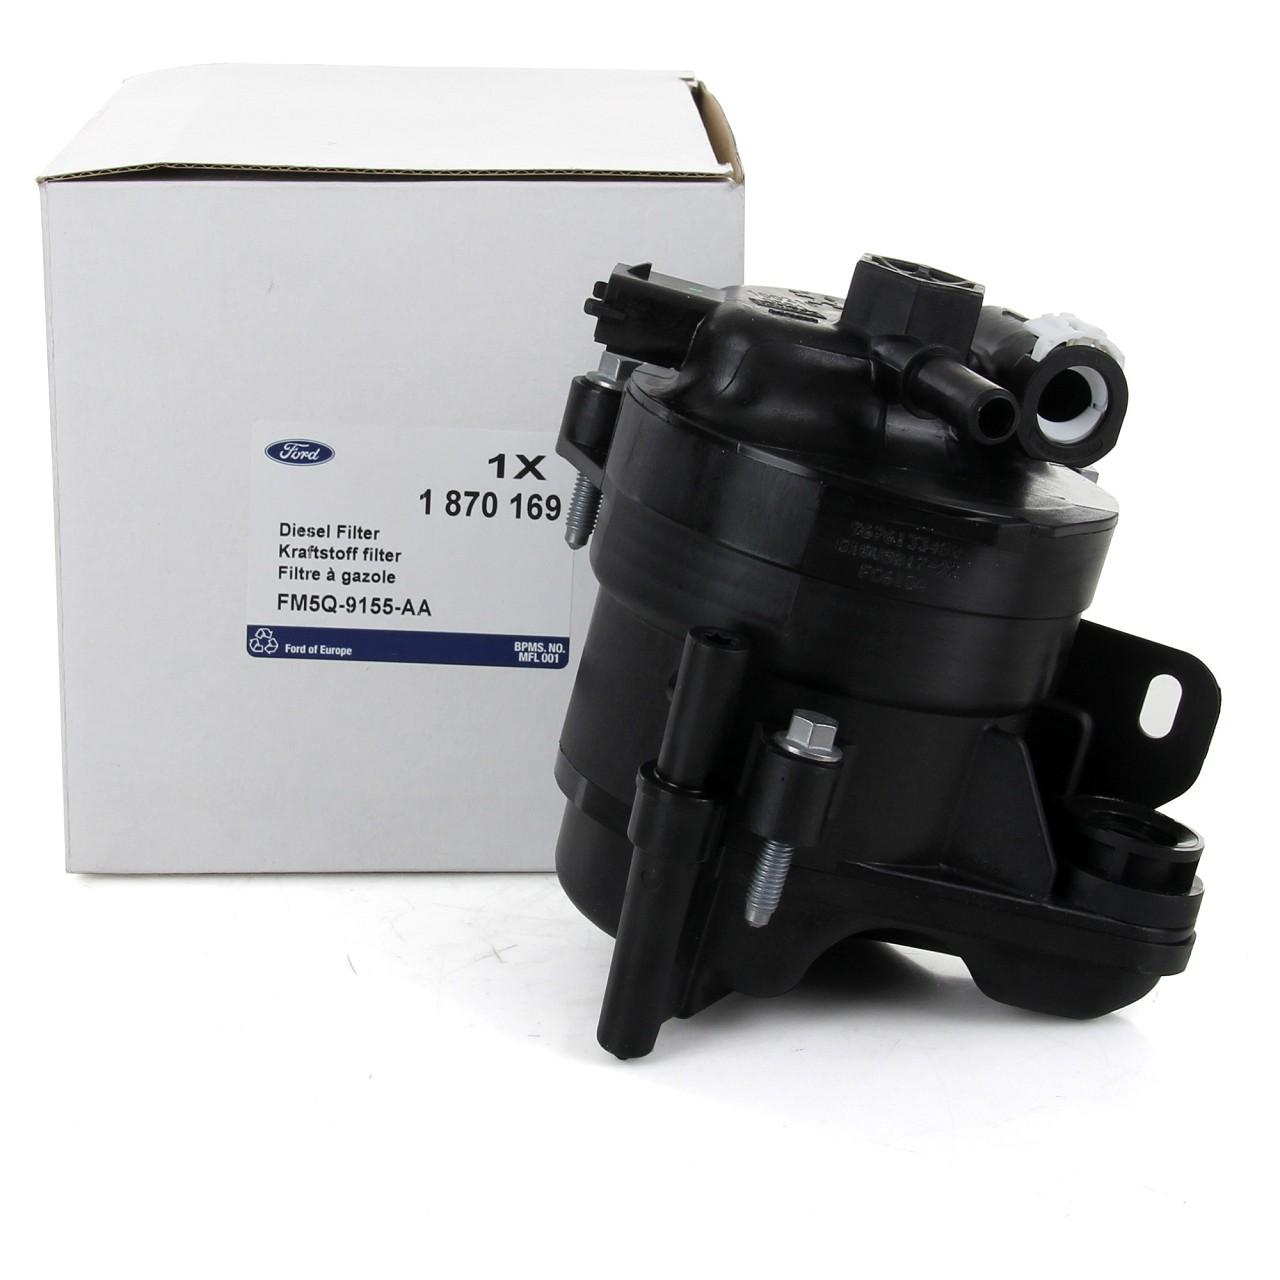 ORIGINAL Ford Kraftstofffilter Dieselfilter FIESTA VI FOCUS III 1.5TDCi 1870169